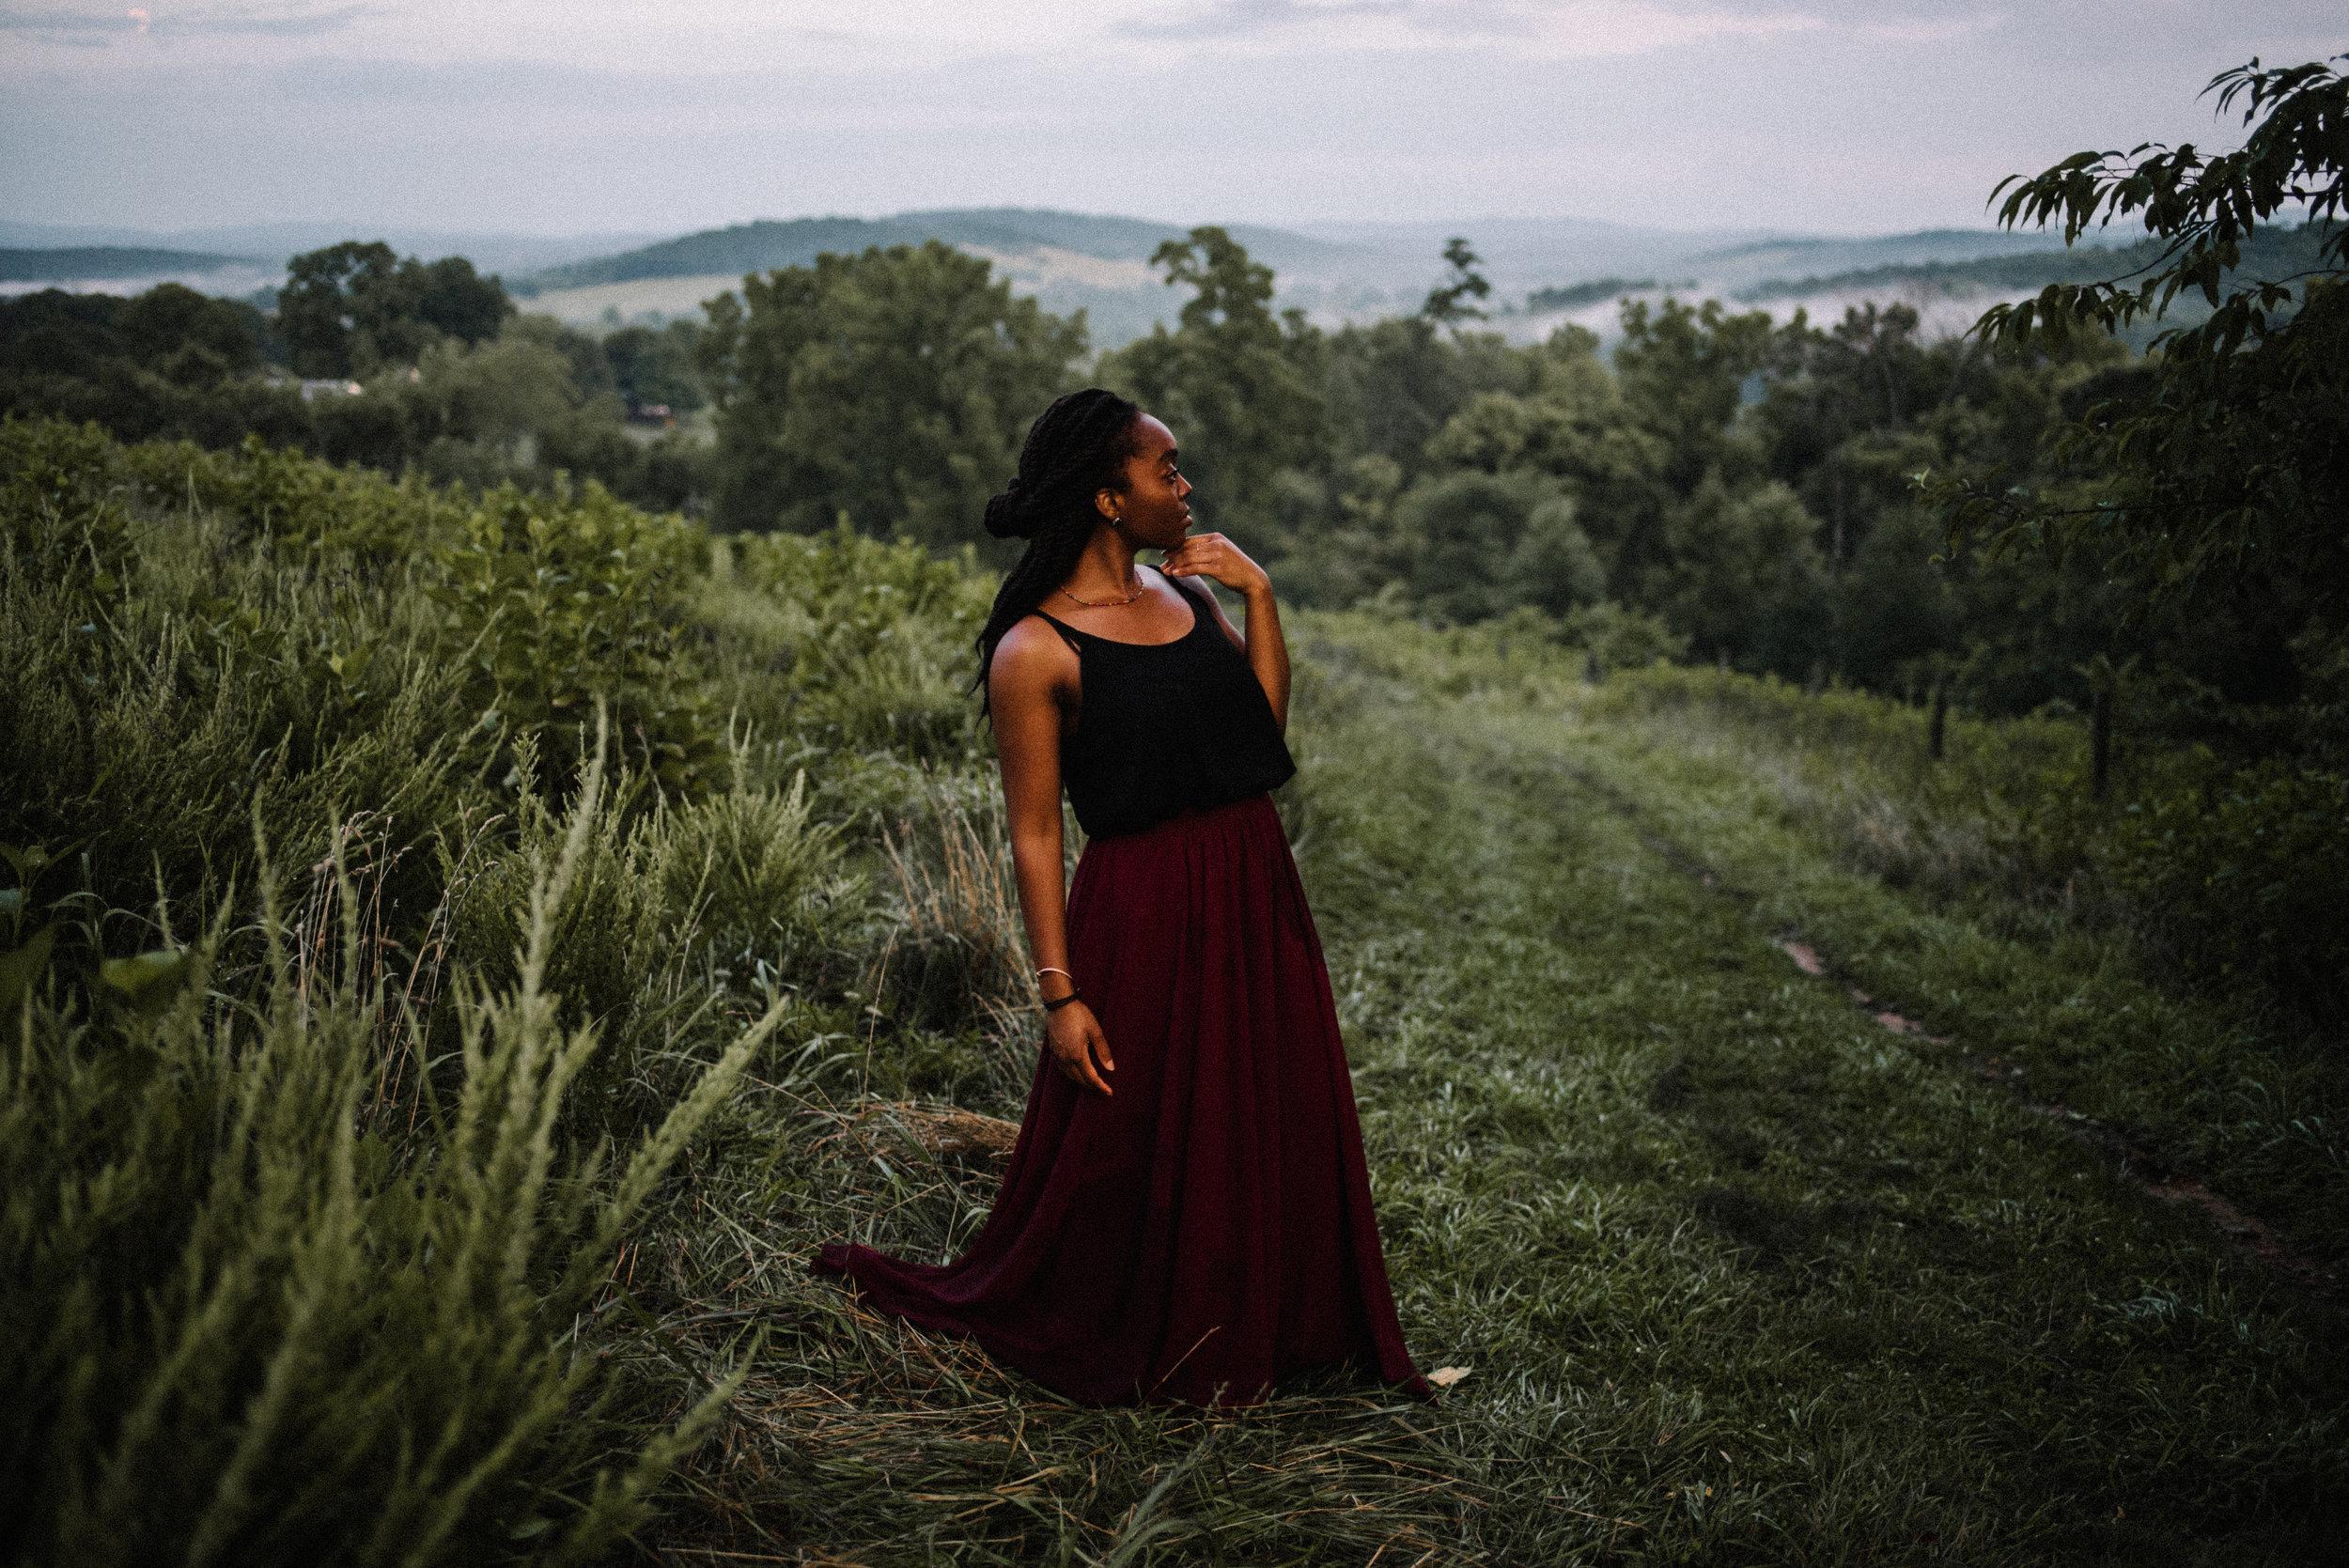 Mercy - White Sails Photography - adventure portraits - sky meadows state park 10.JPG